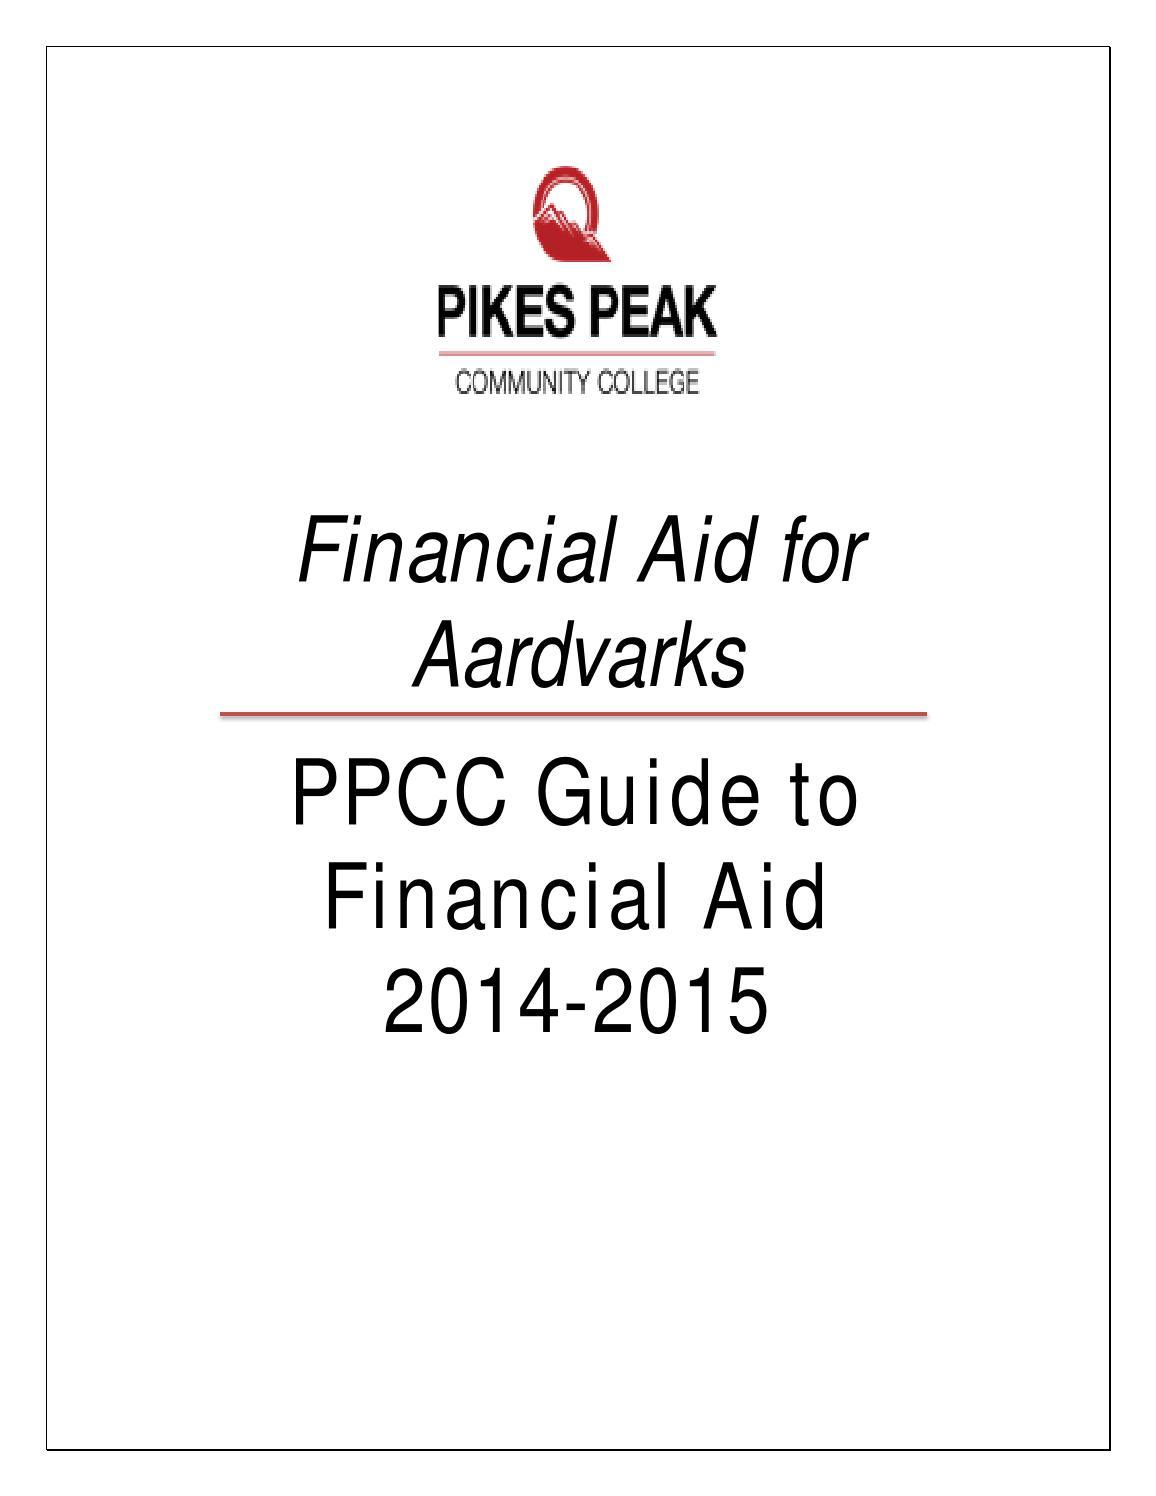 2014-2015 Financial Aid Handbook by Pikes Peak Community